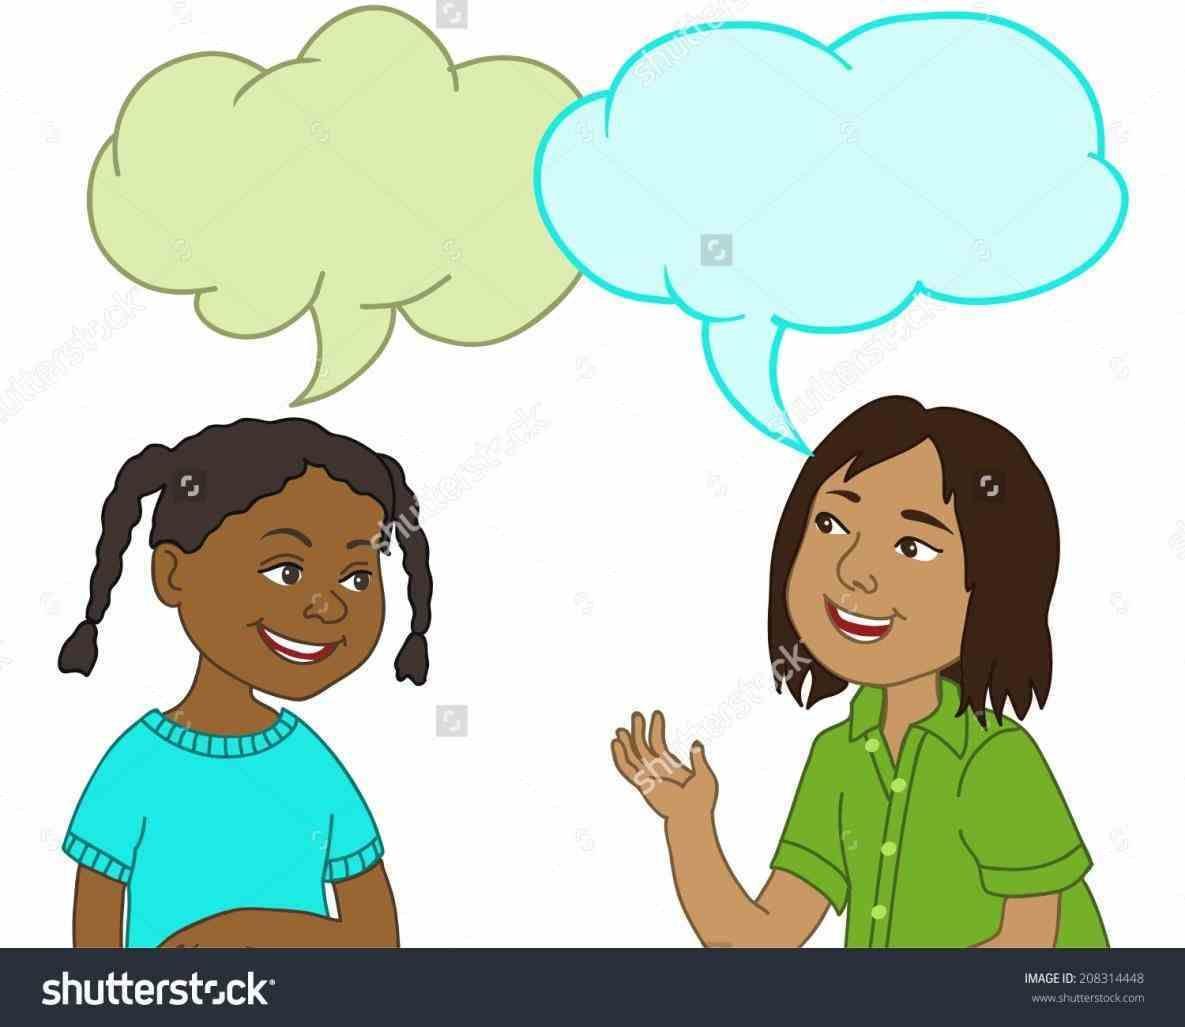 Conversation clipart child conversation. Next two kids talking